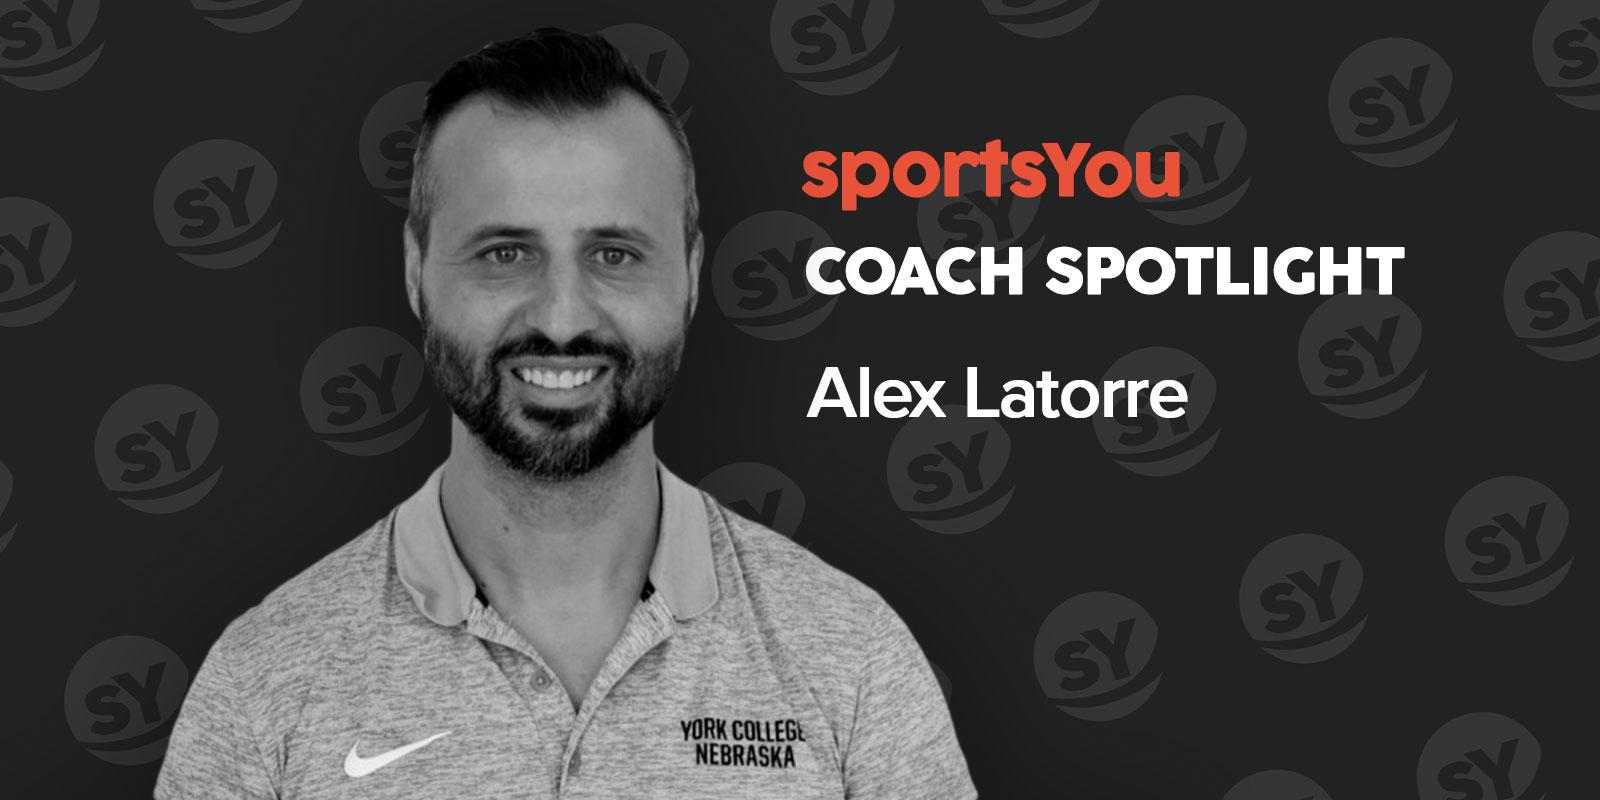 sportsYou Coach Spotlight: Q&A with Coach Alex Latorre - Photo by sportsYou Photography